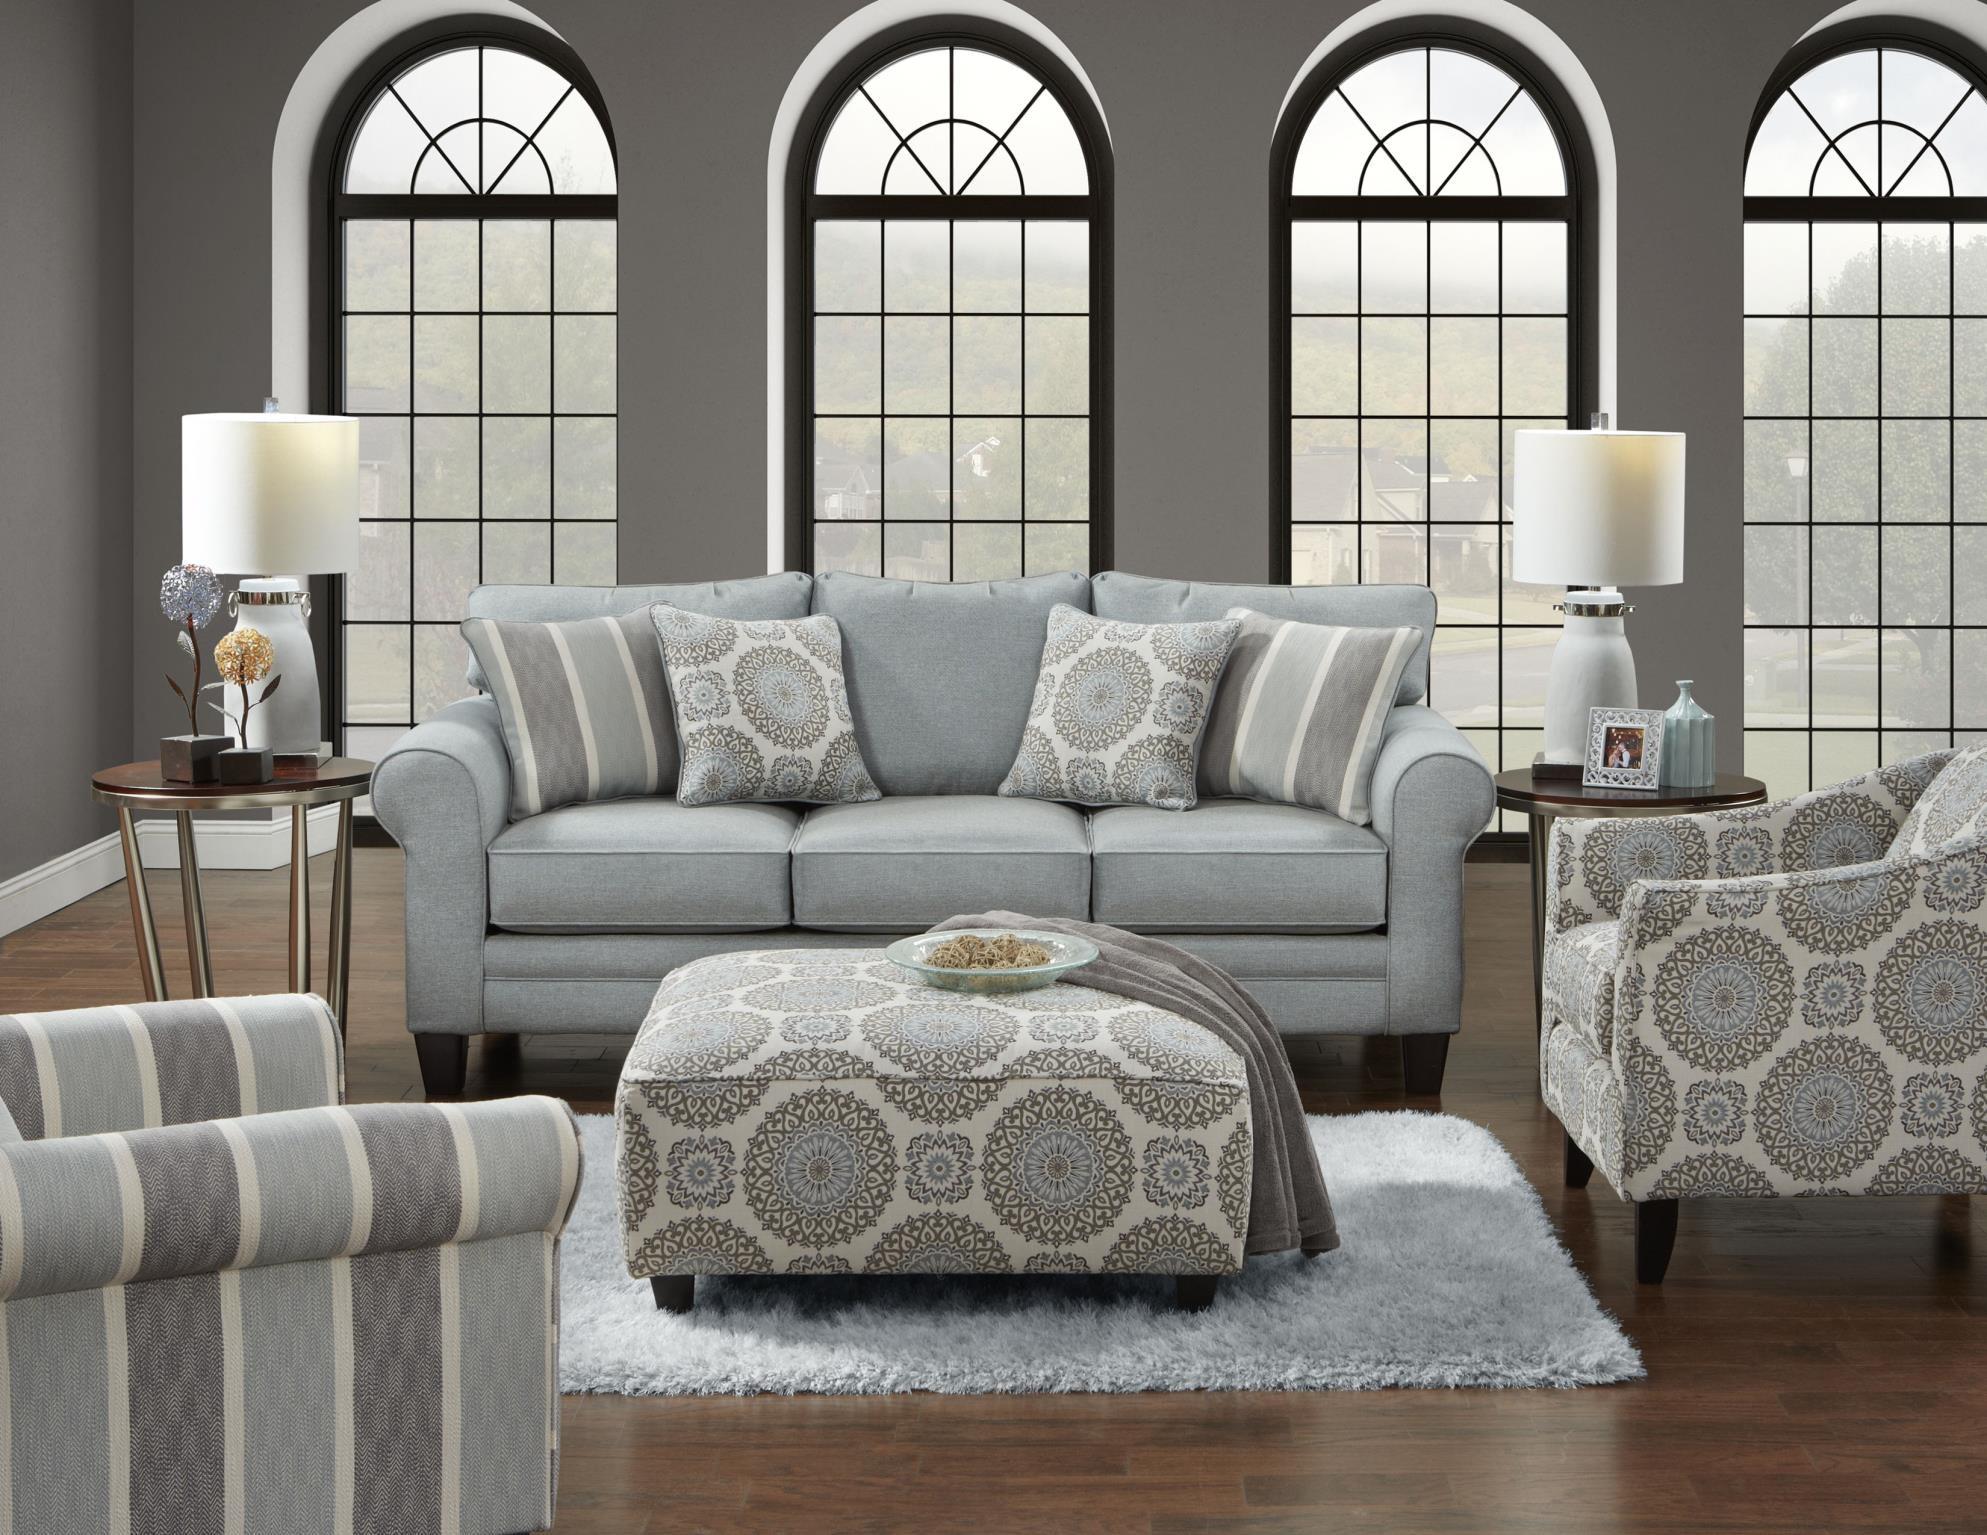 Living Room Sets Greensboro Nc delighful living room sets greensboro nc bed f inside design ideas